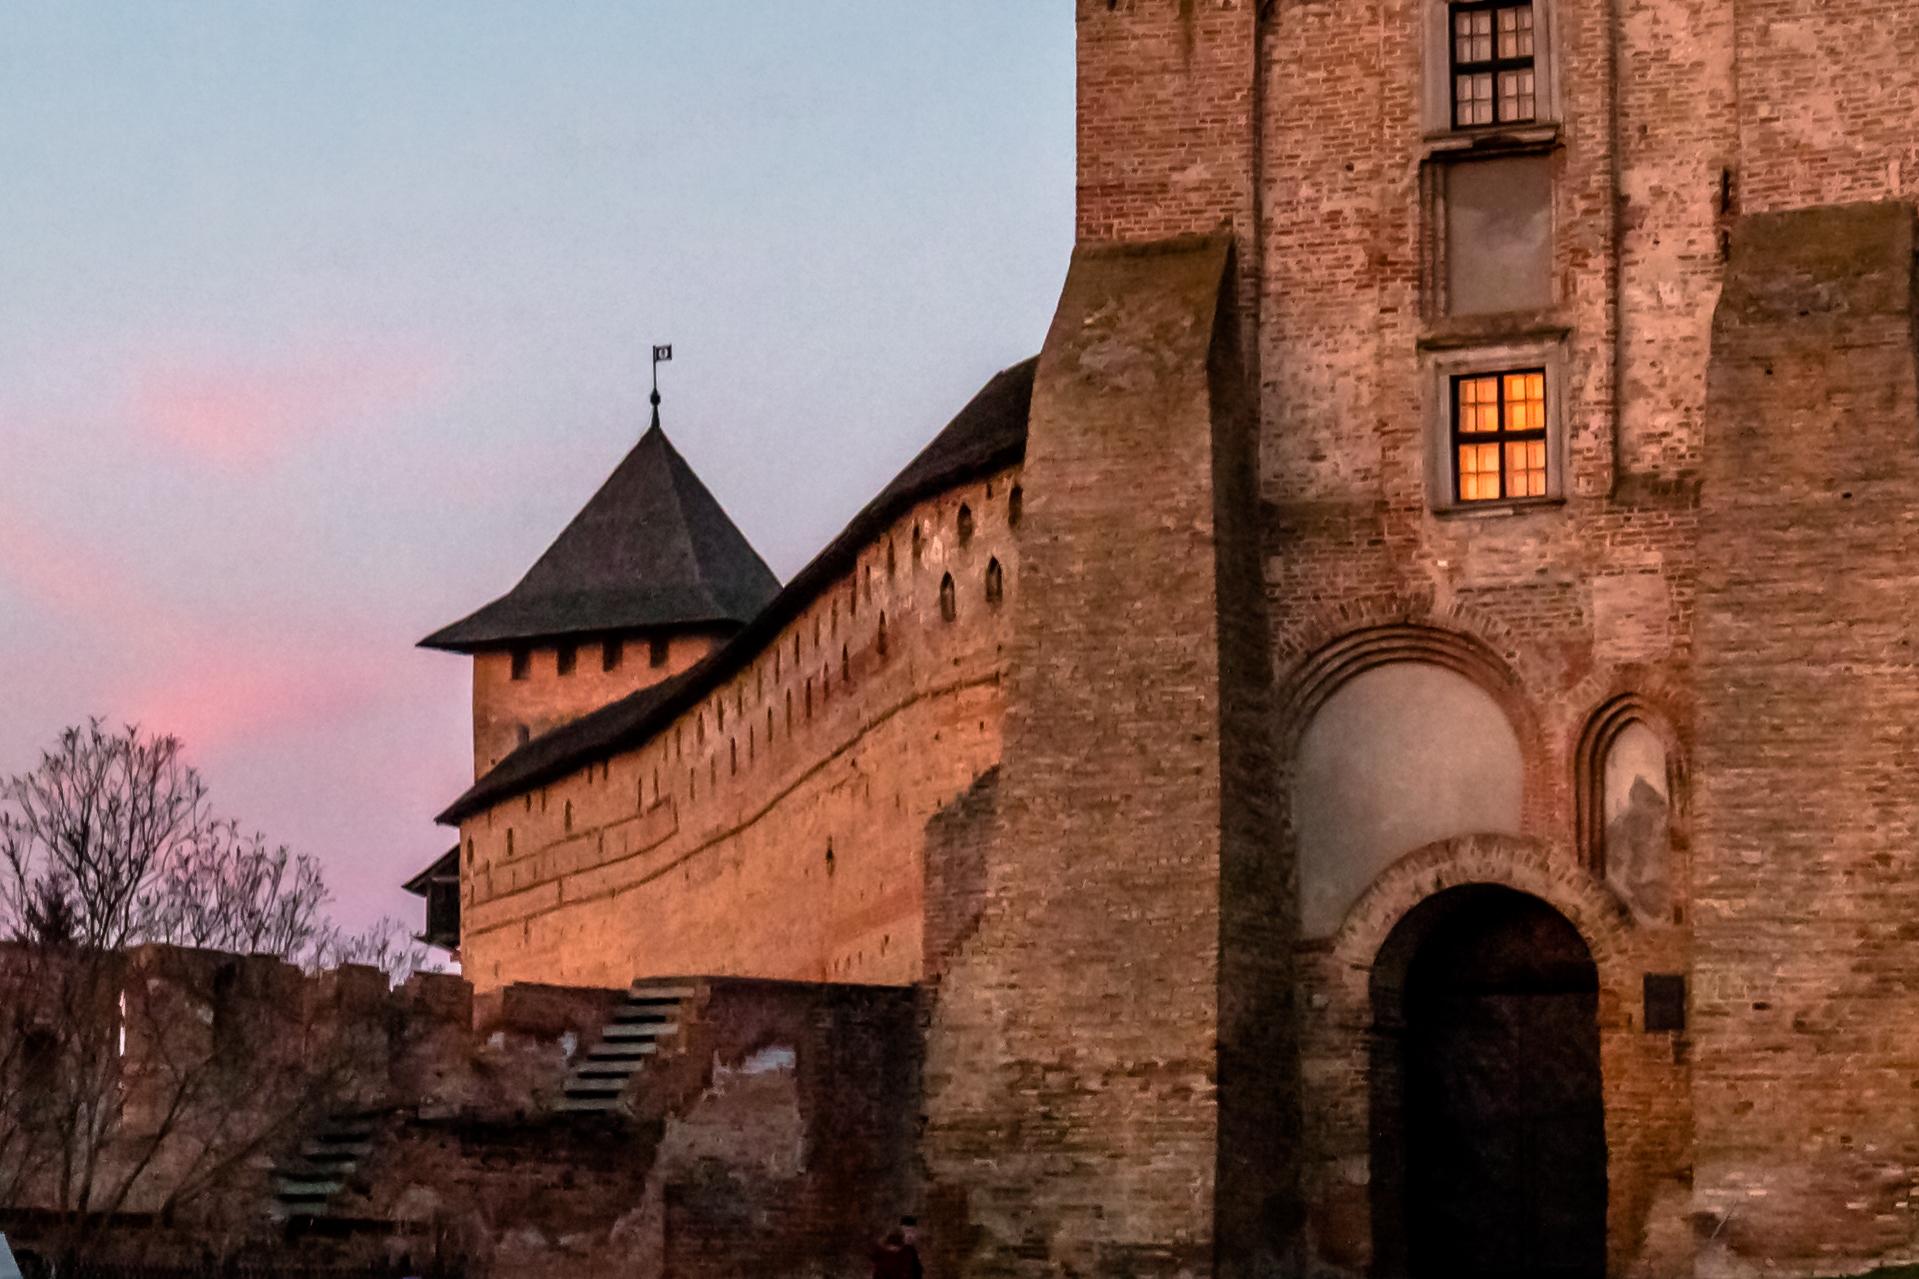 Lutsk Castle, Ukraine